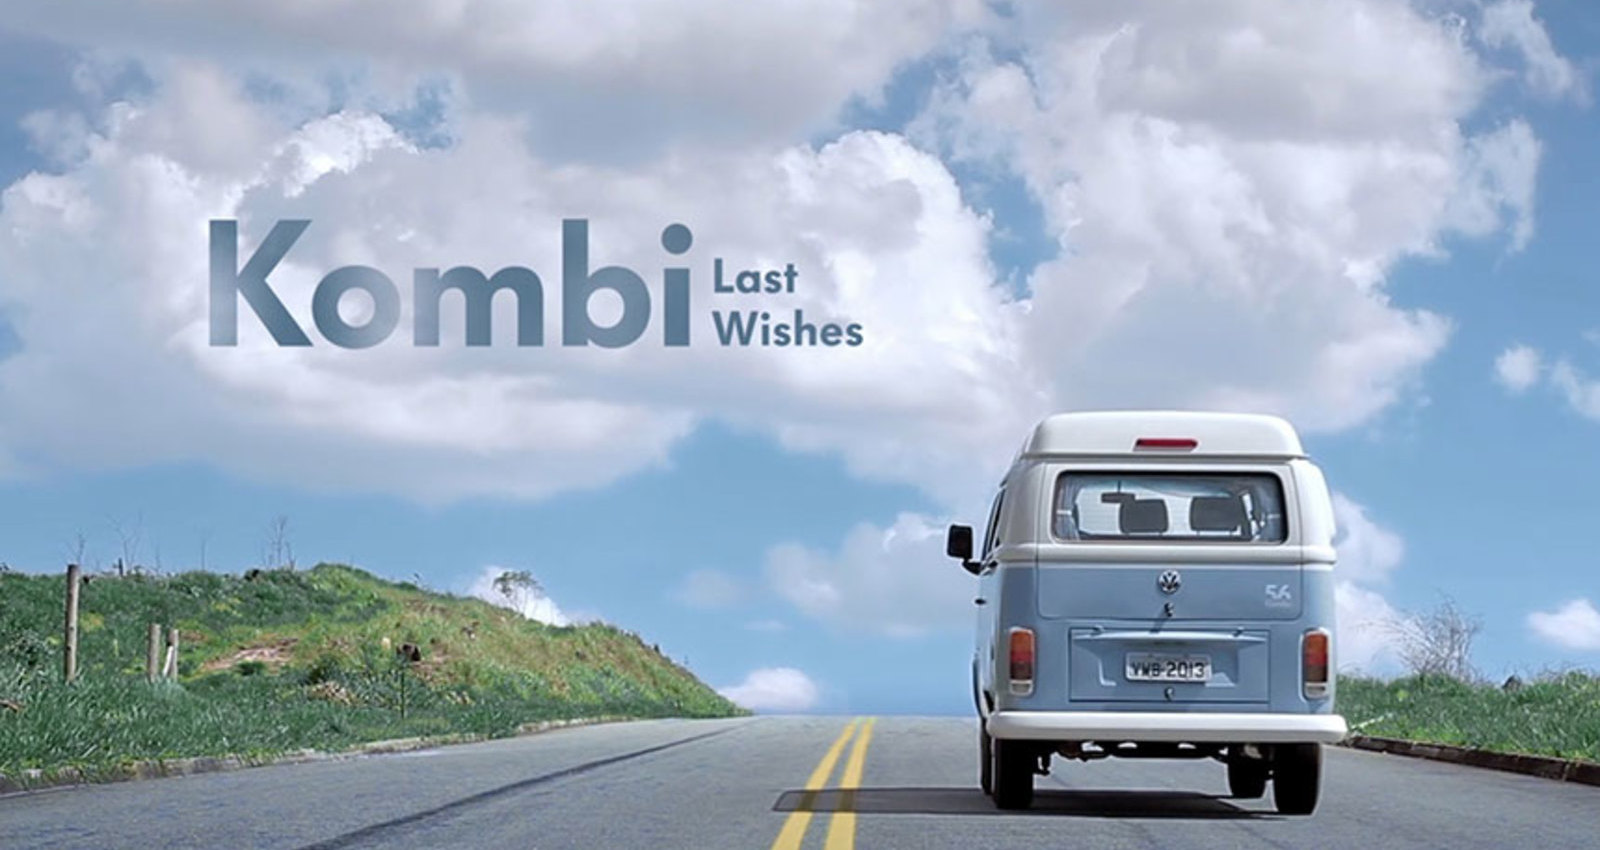 Kombi Last Wishes